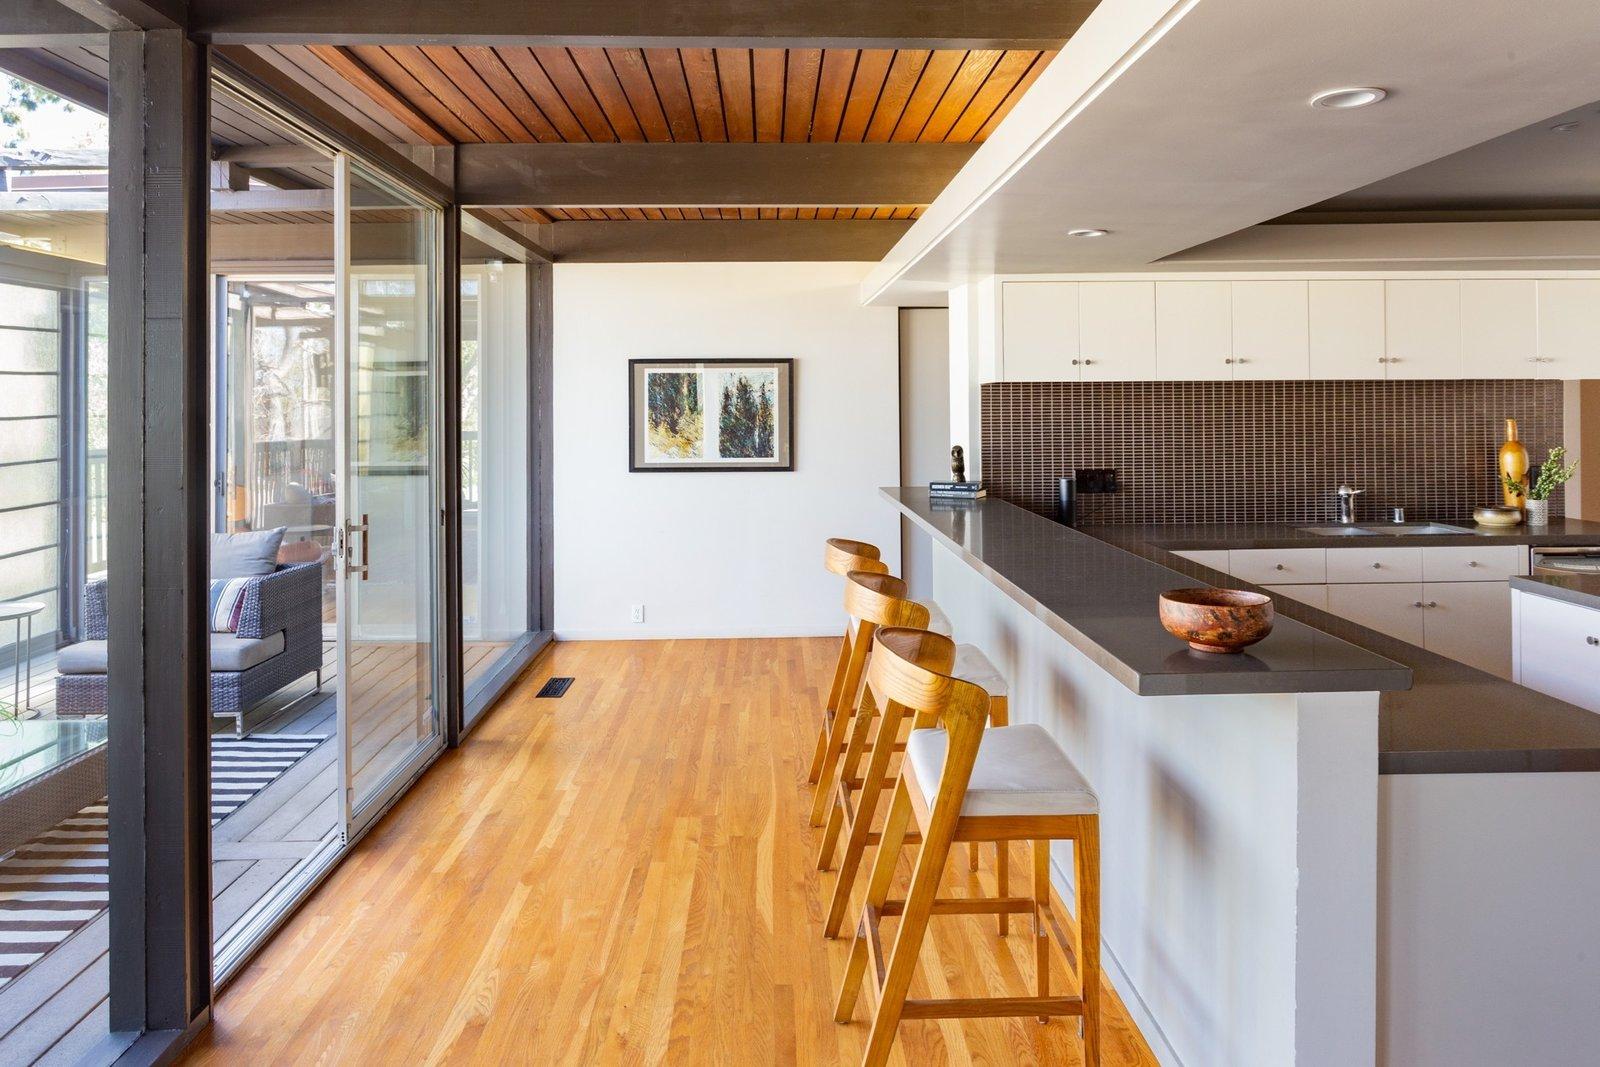 Yuen Residence kitchen